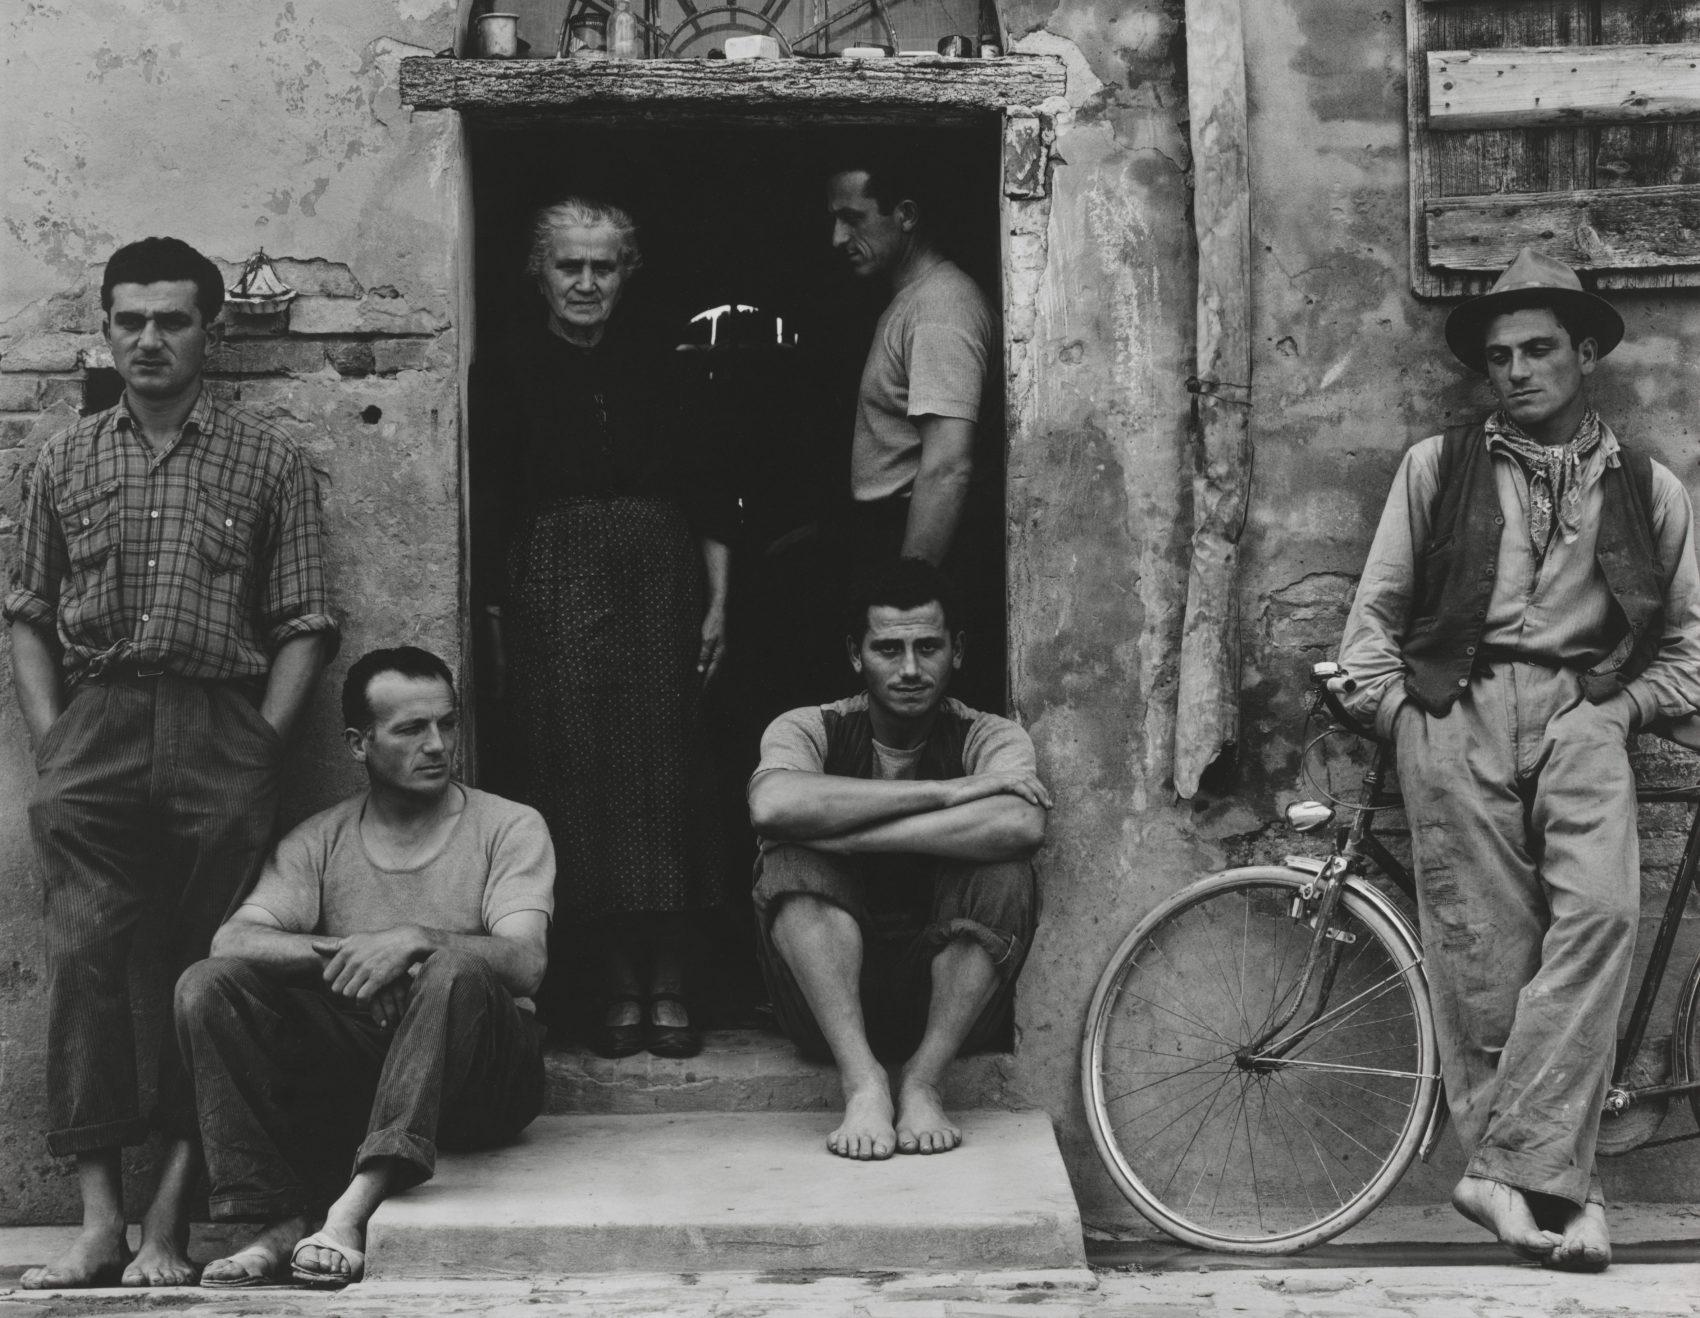 Paul Strand Photograph V&A